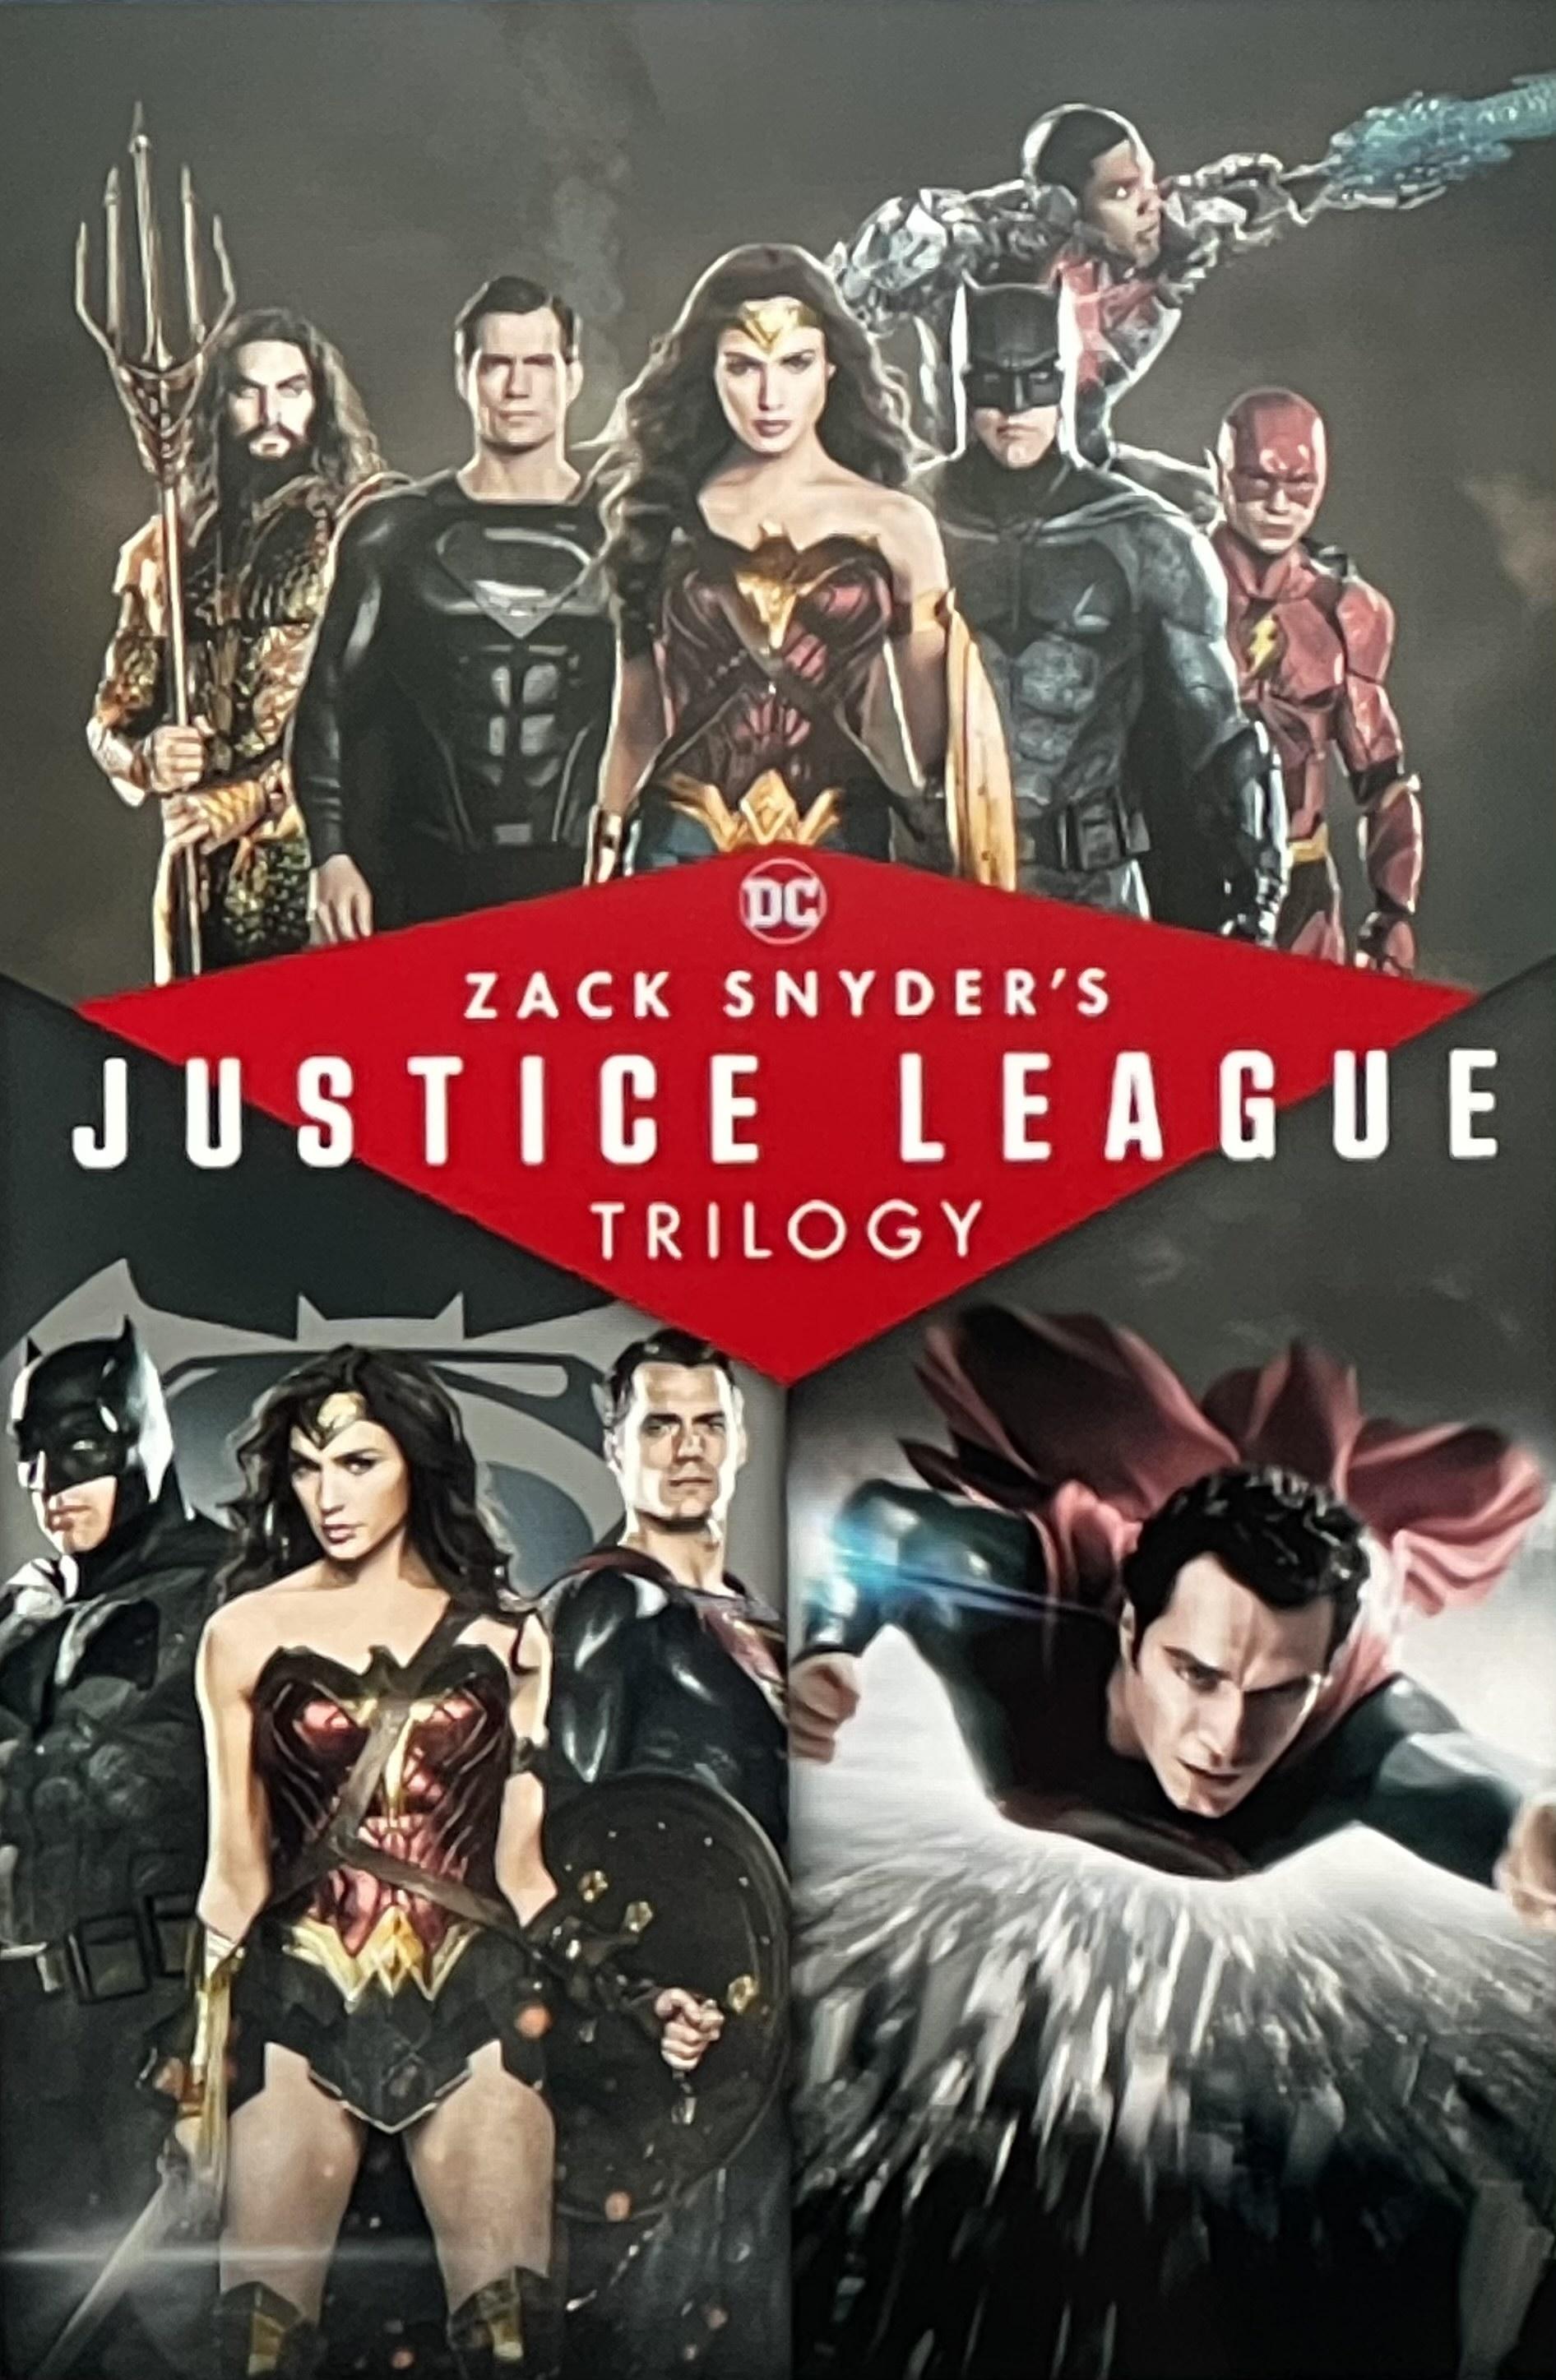 Zack Snyder's Justice League Trilogy 4K @ iTunes - £19.99